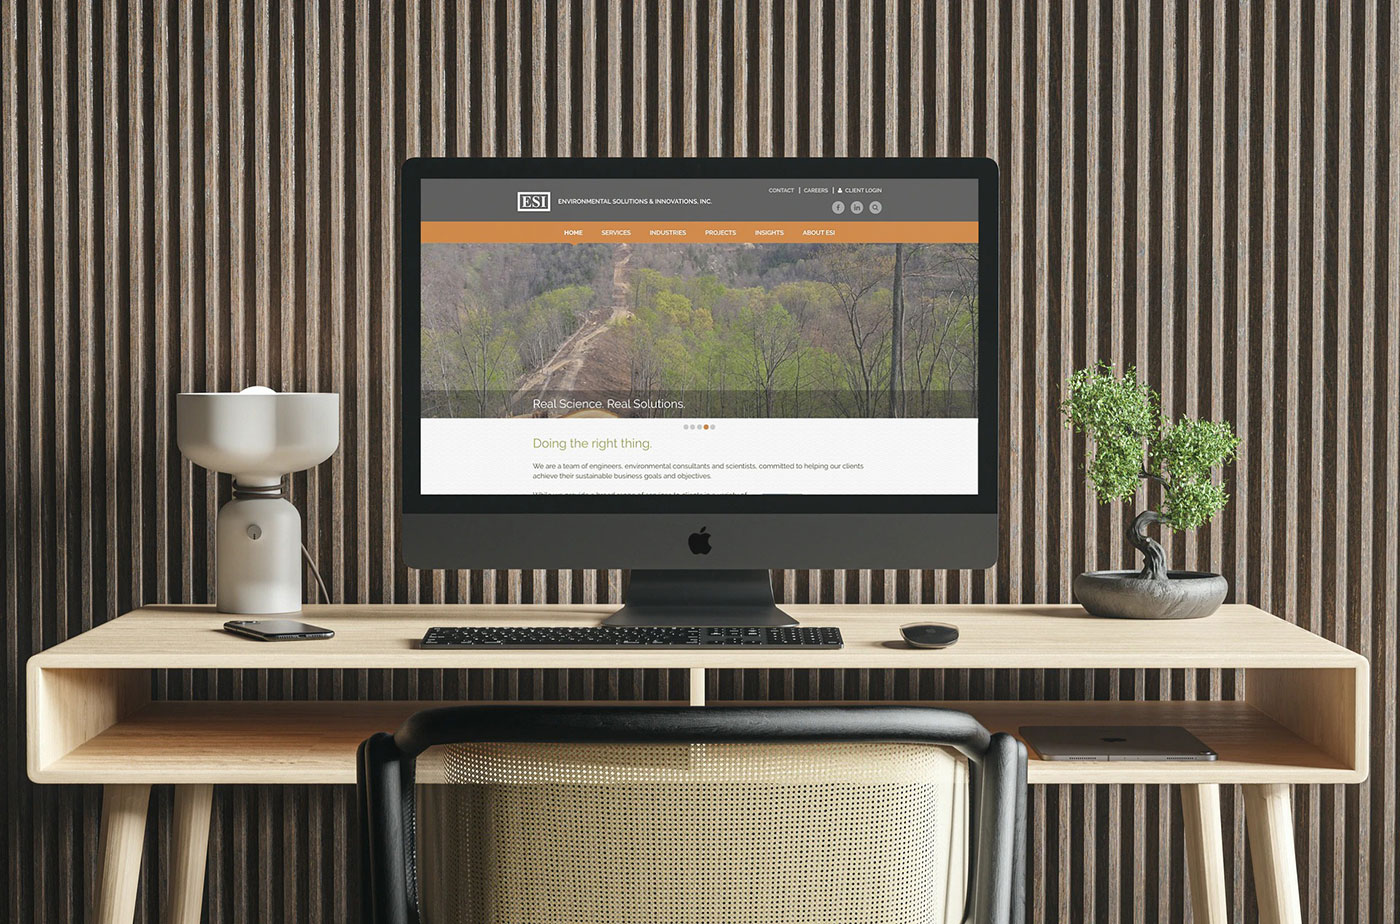 Environmental Solutions & Innovations, Inc SEO optimized website on a desktop computer